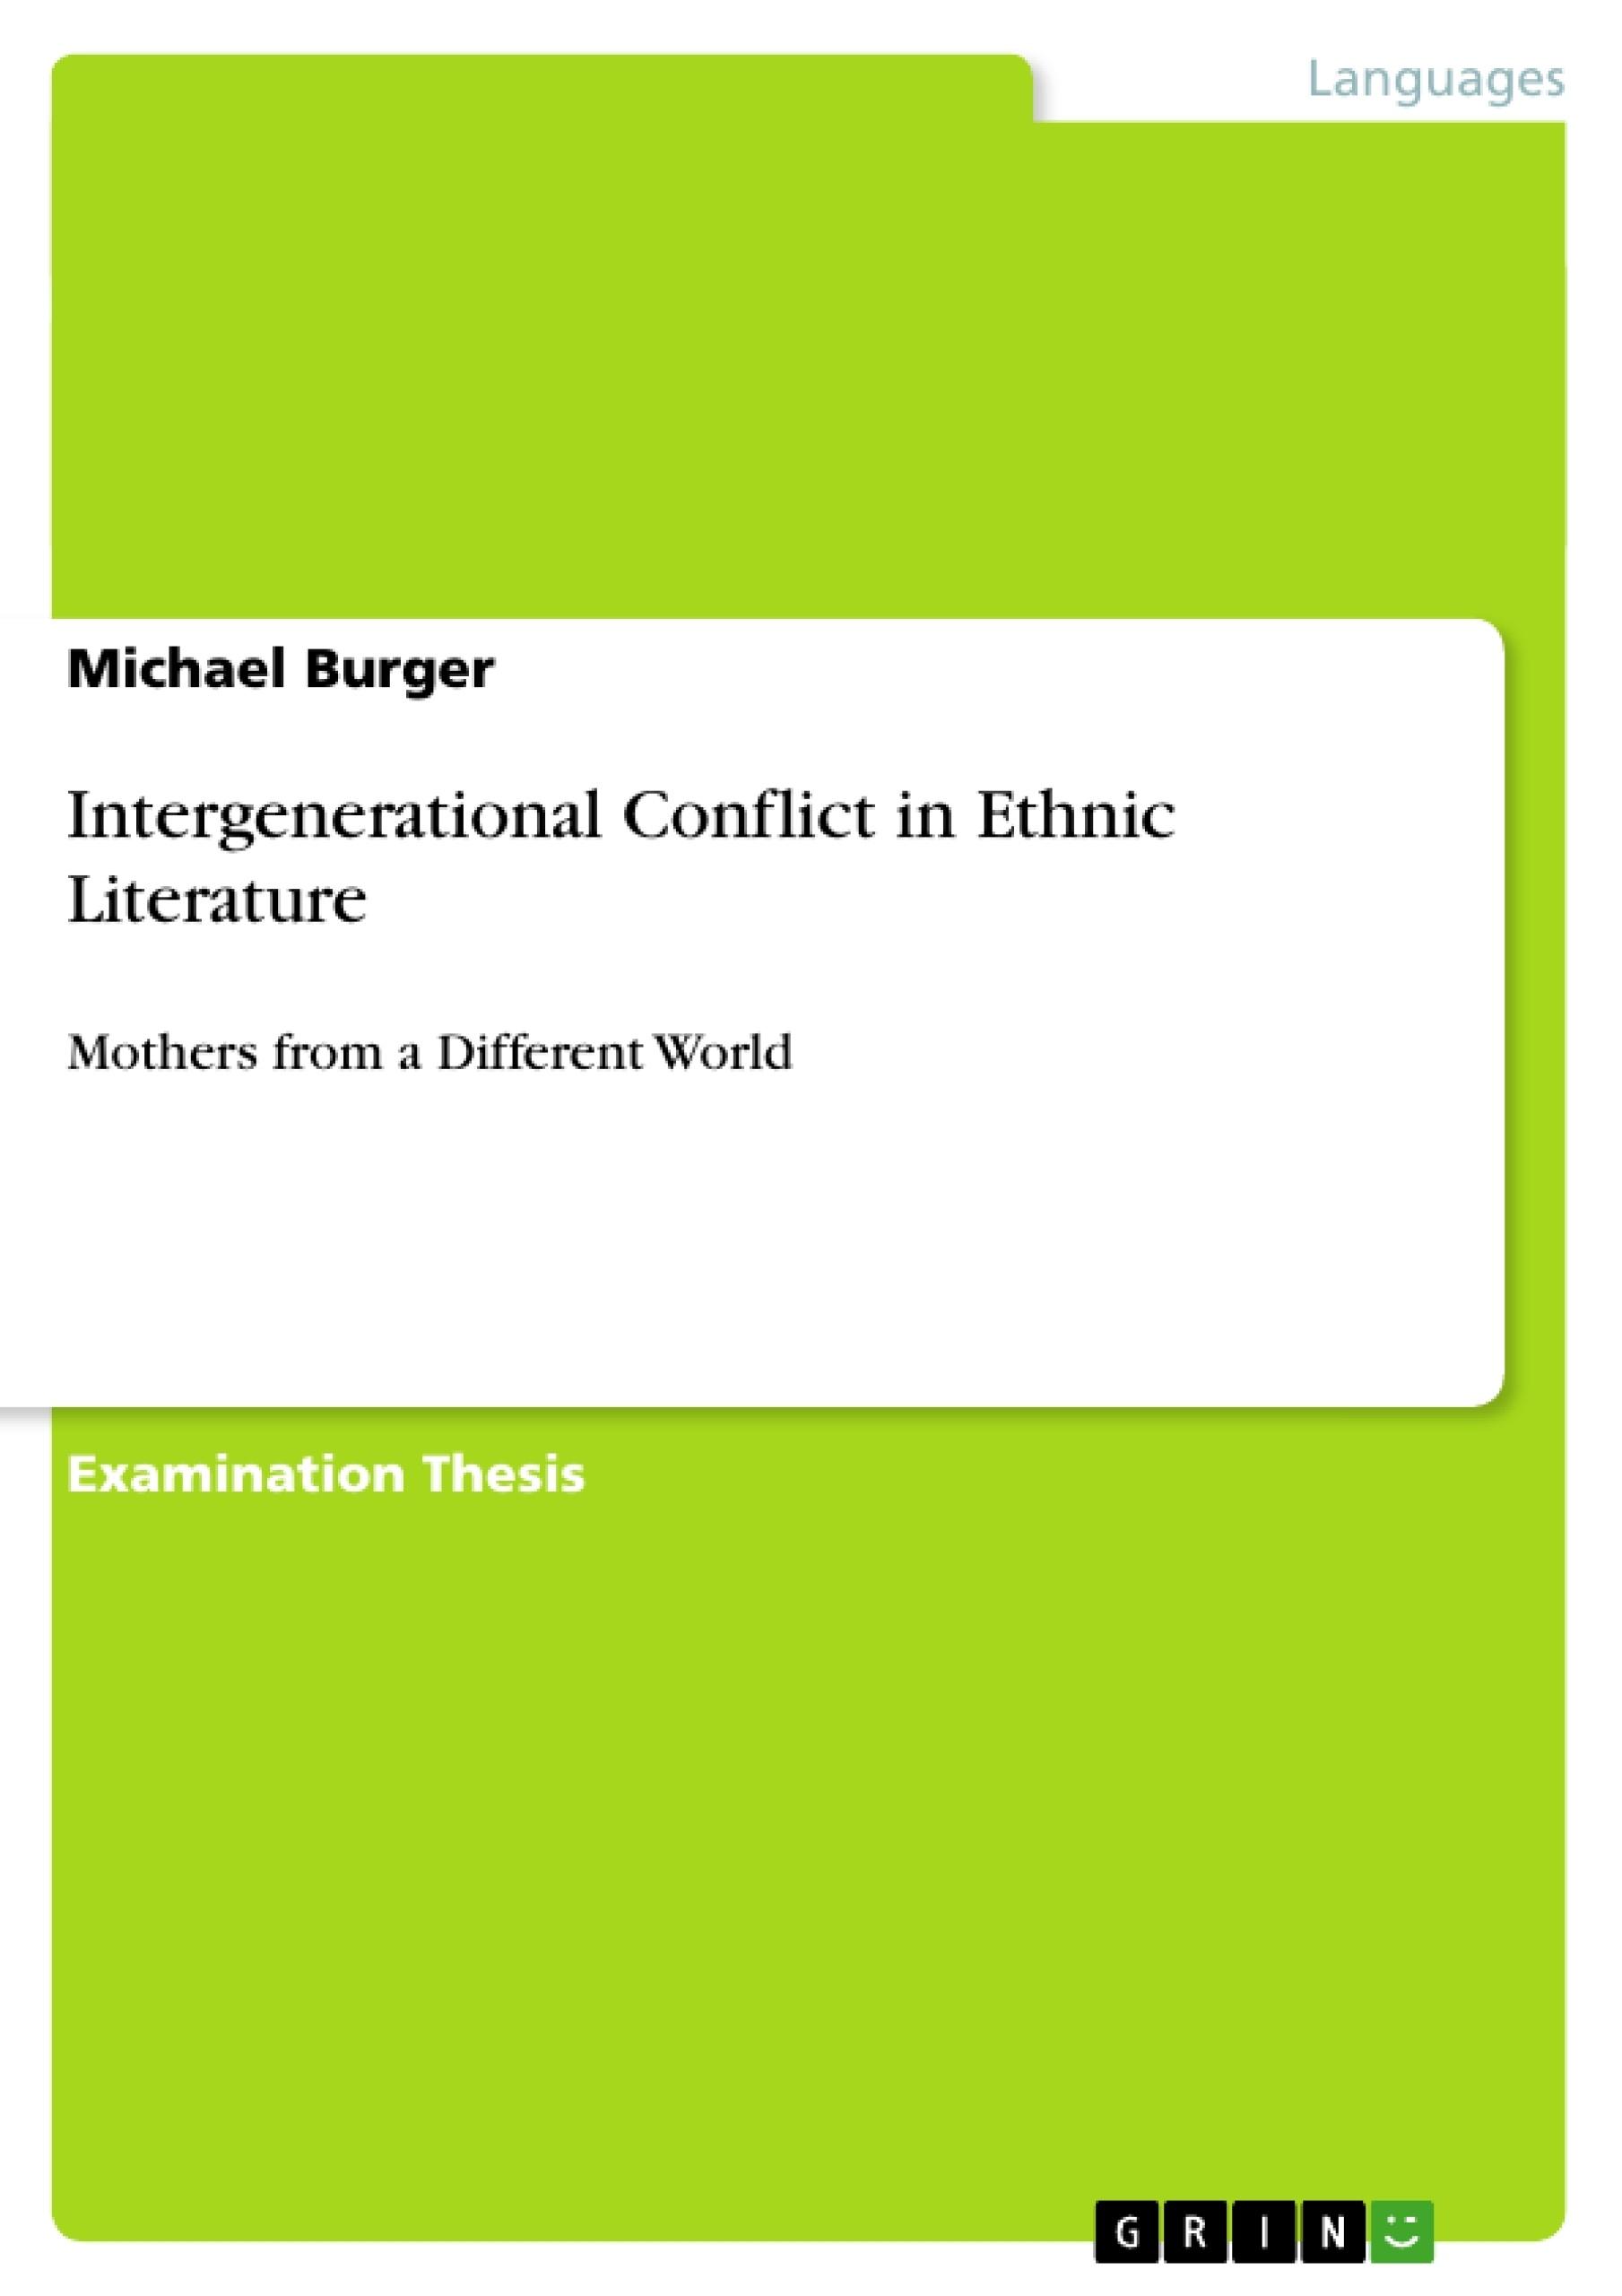 GRIN - Intergenerational Conflict in Ethnic Literature